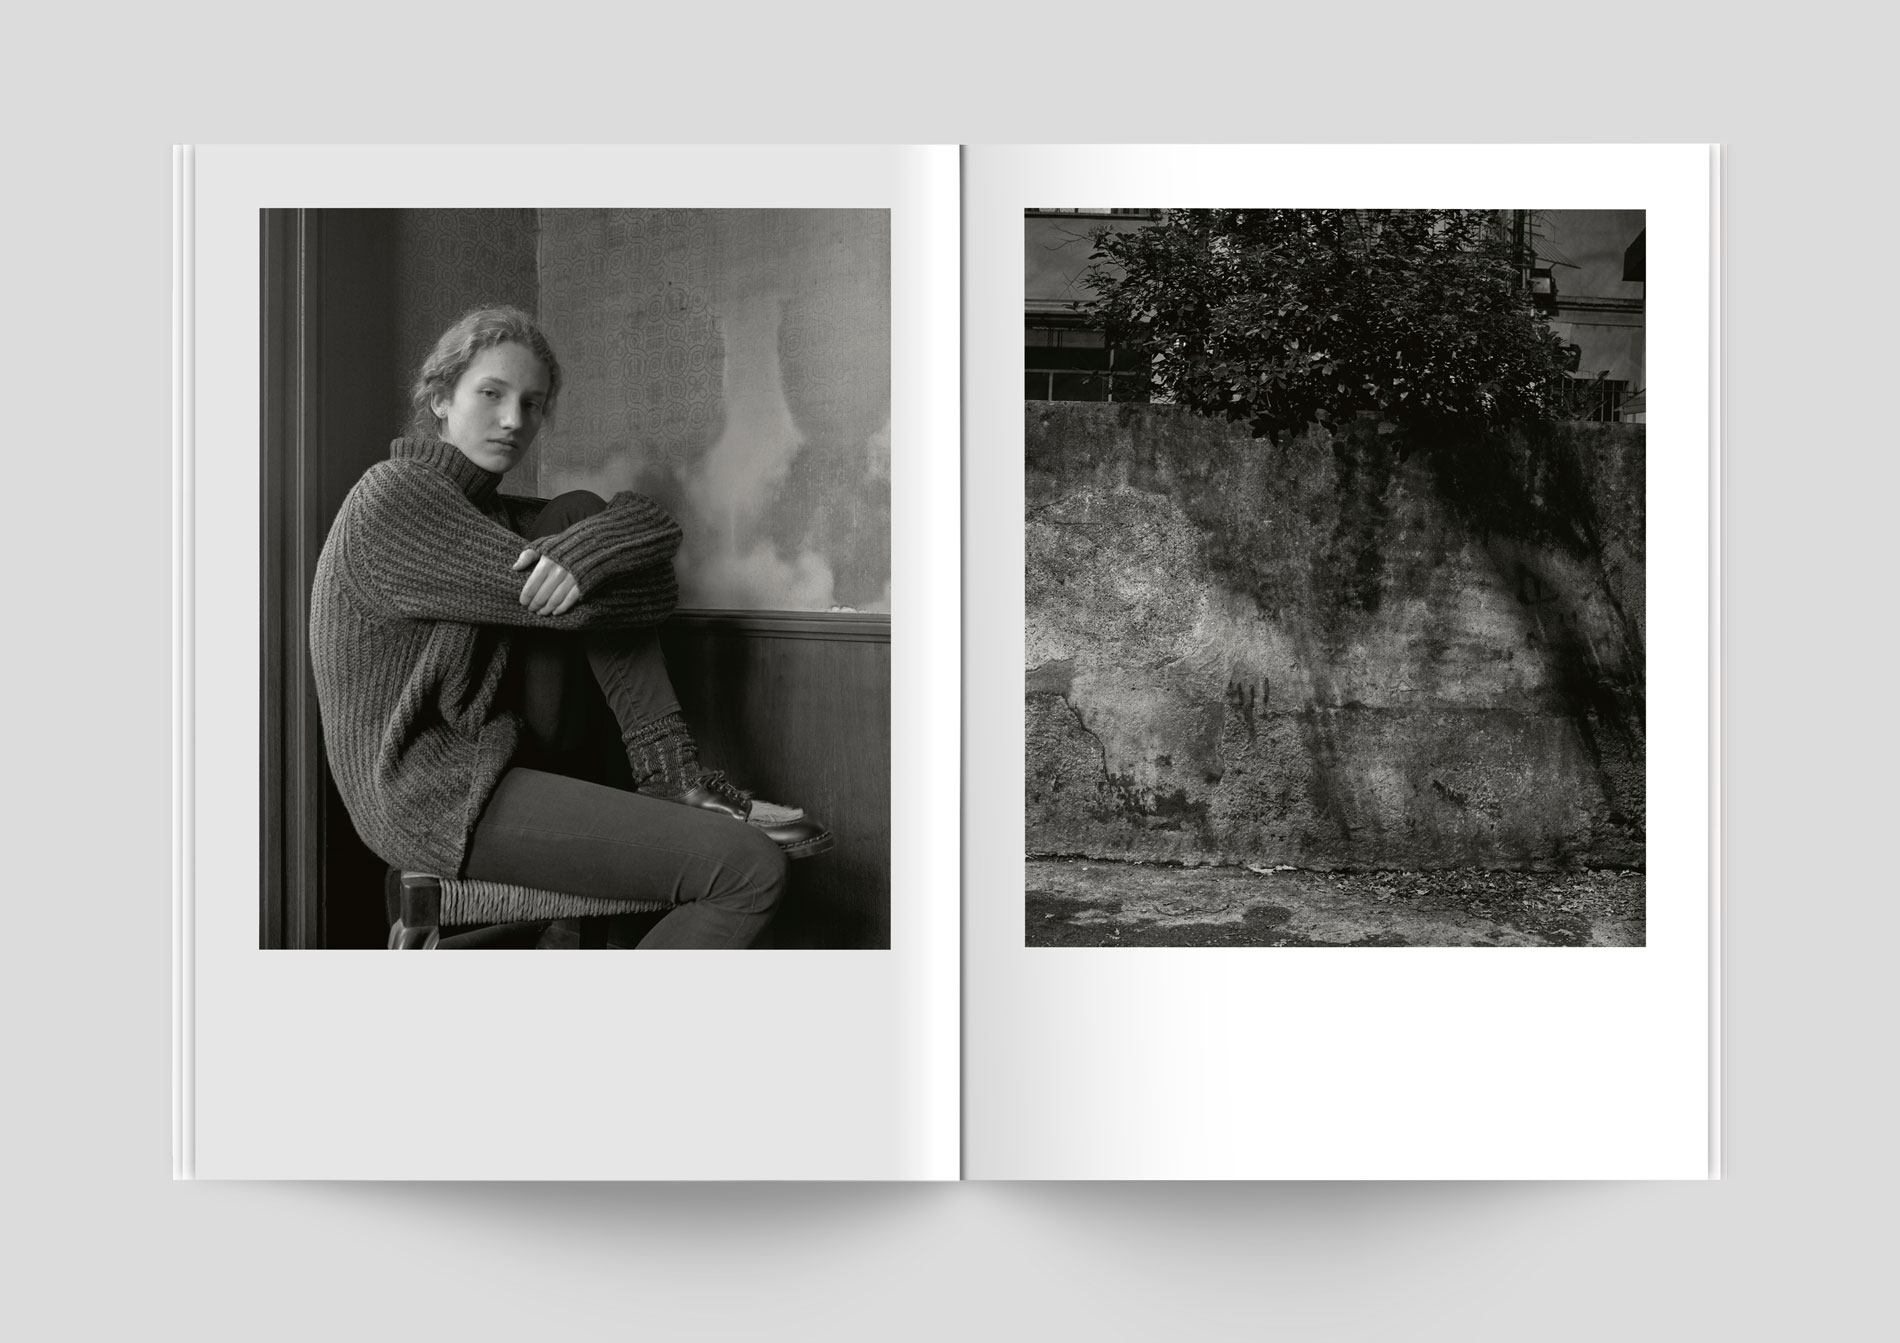 Santoni-Edited-by-Marco-Zanini-Ingar-Krauss-07